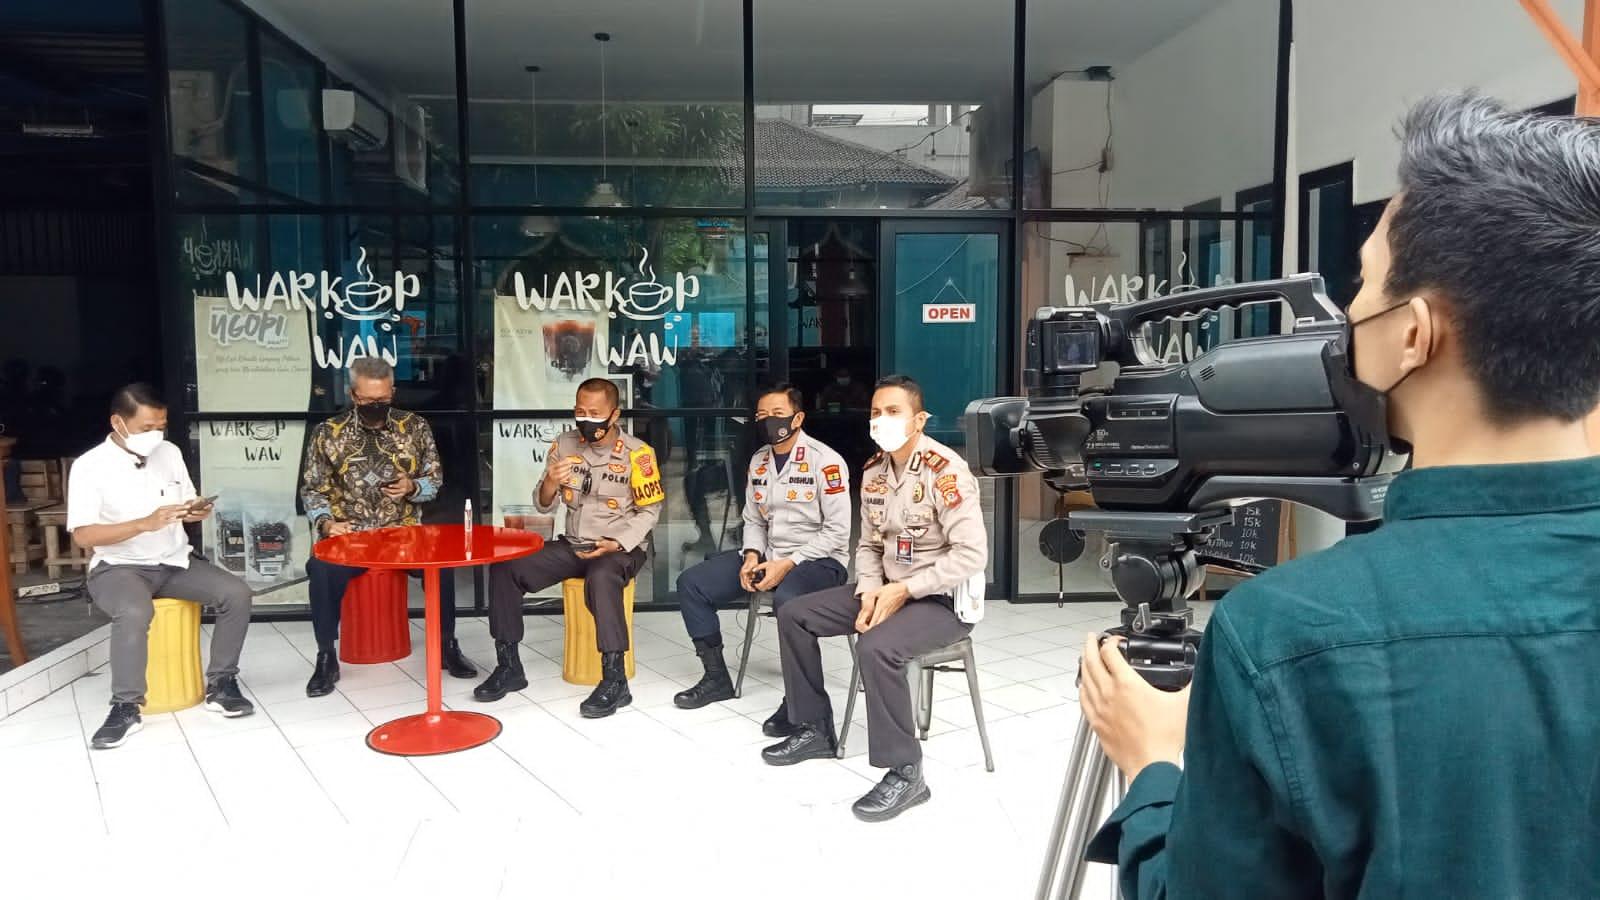 Kapolres Cirebon Kota Bersama Pemda Kota Cirebon Sosialisasi Penerapan Ganjil-genap